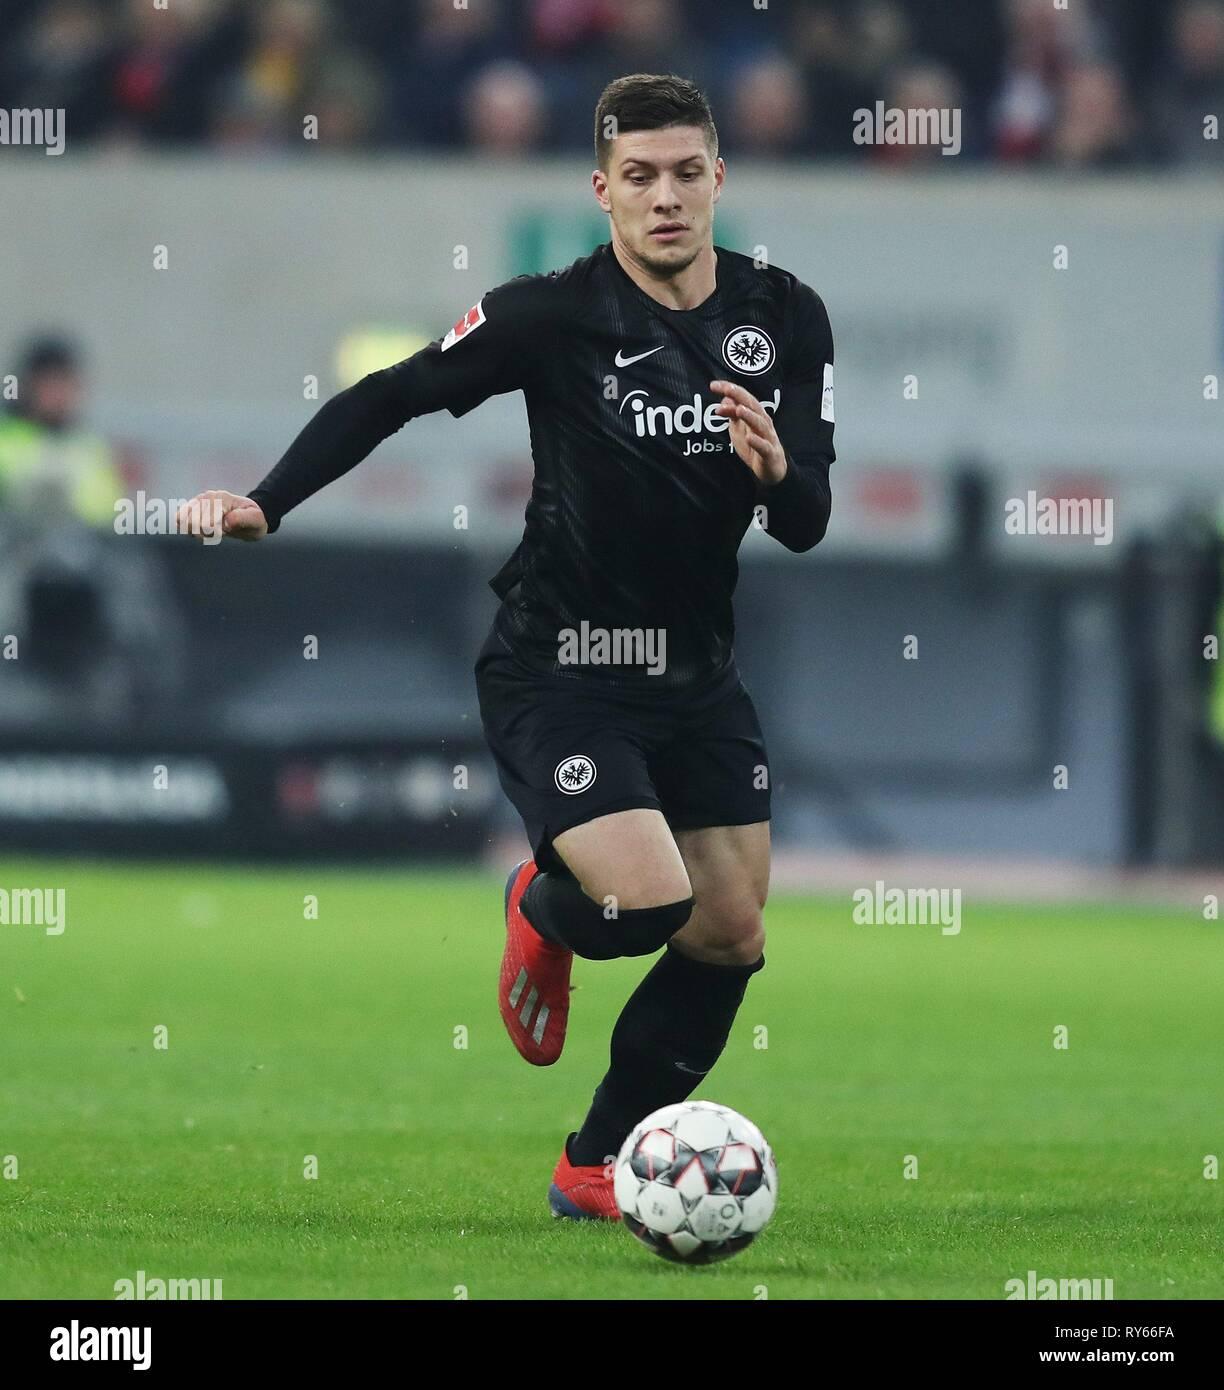 firo: 11.03.2019, Football, 2018/2019, 1.Bundesliga Fortuna Dusseldorf Dusseldorf - Eintracht Frankfurt 0: 3 Luka Jovic, single action,   usage worldwide - Stock Image